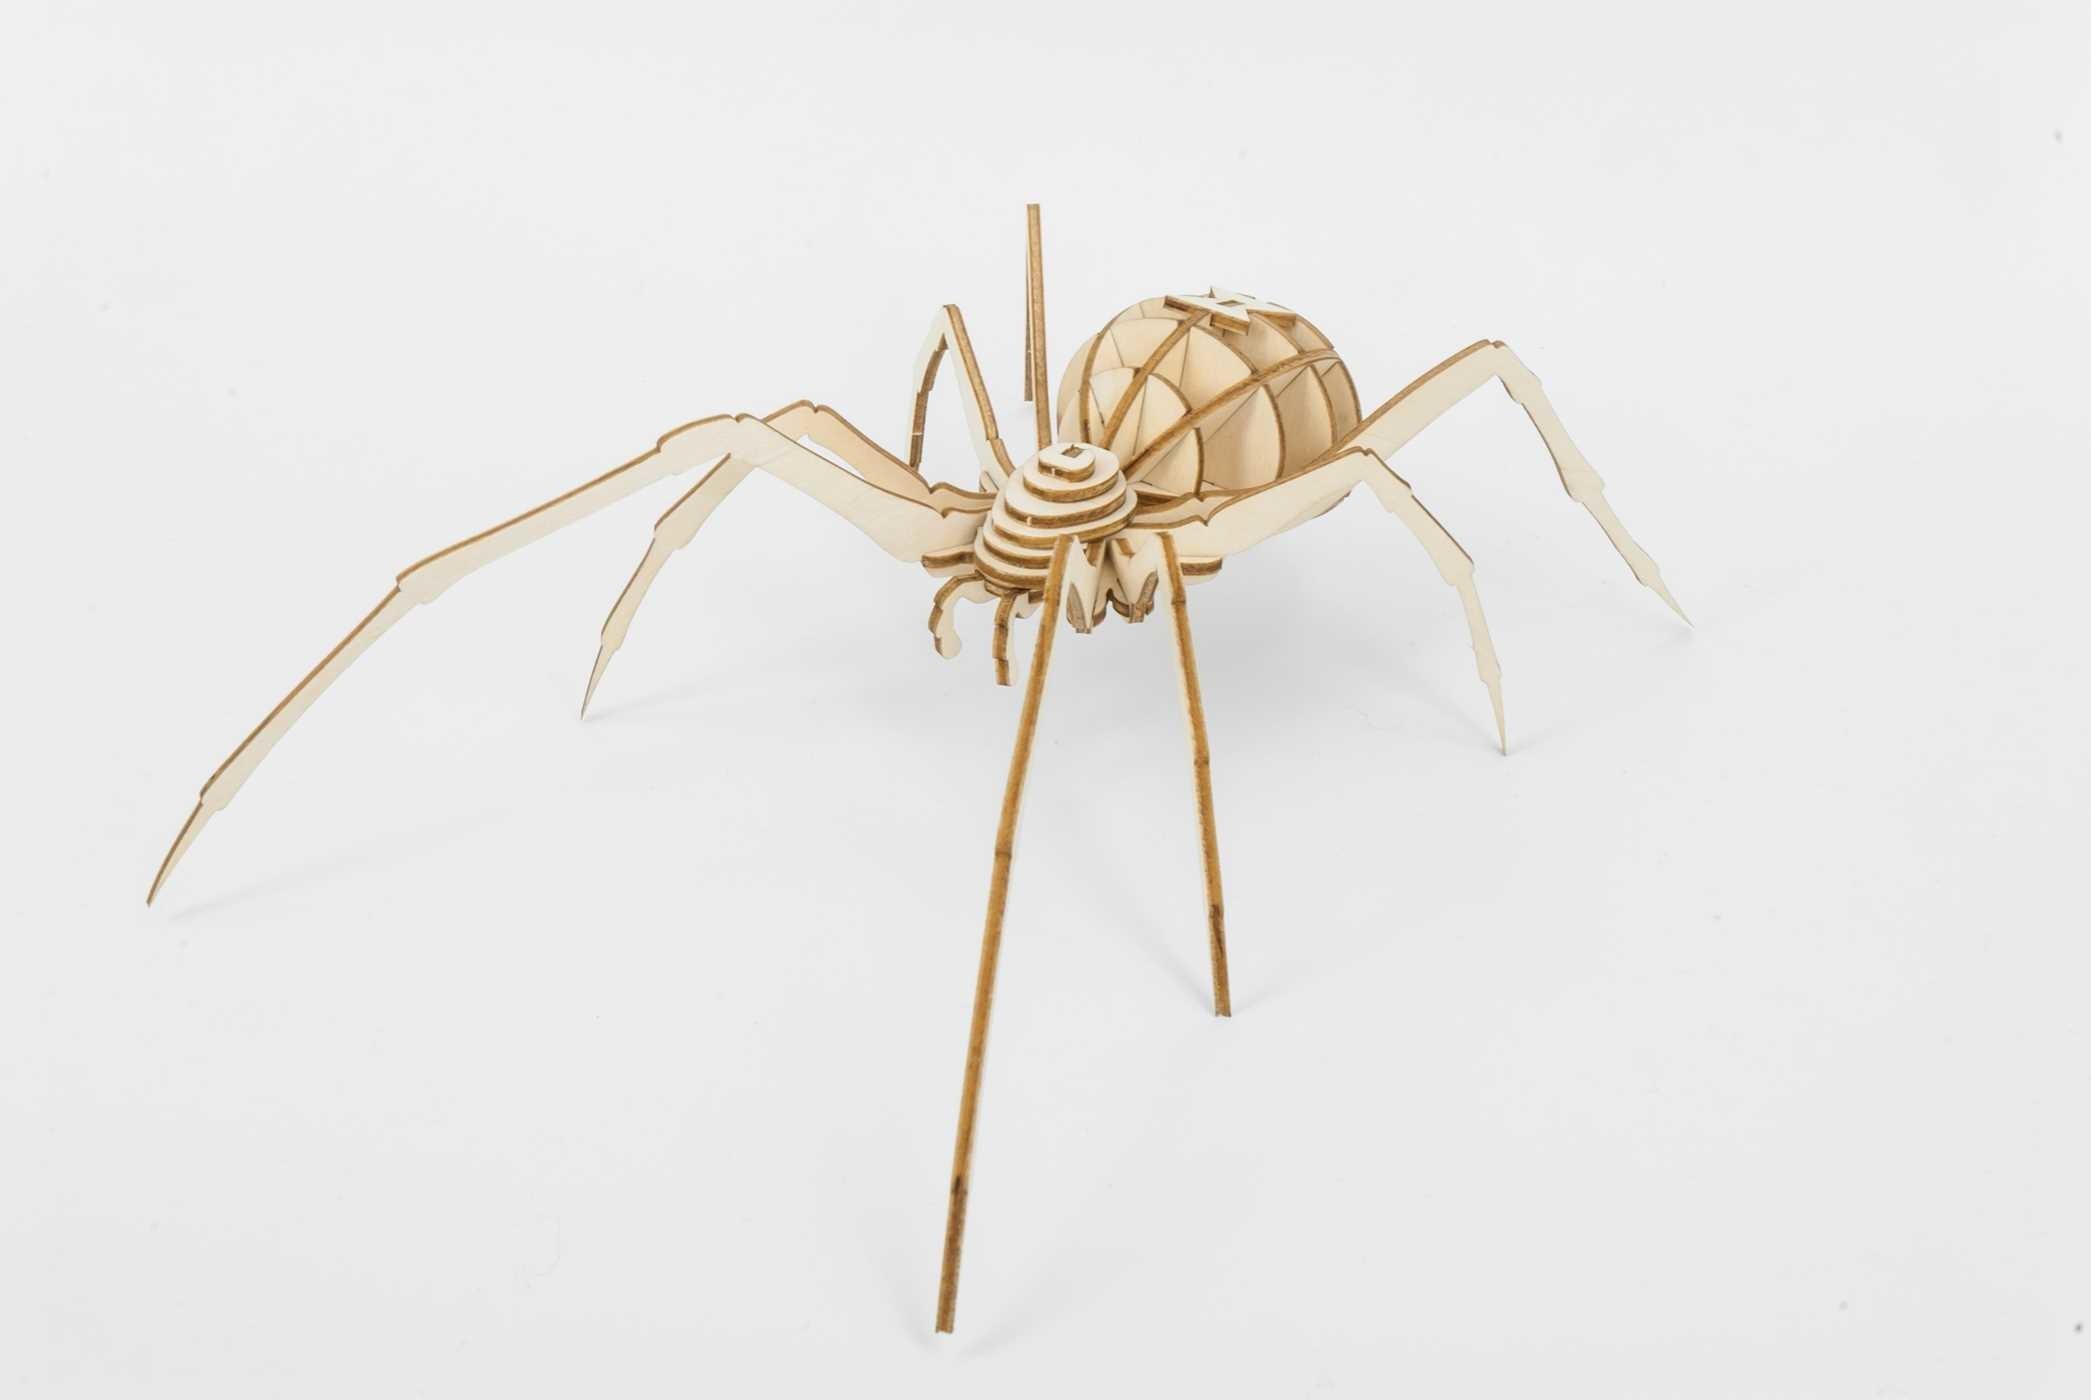 Incredibuilds spider 3d wood model 9781682980415.in01